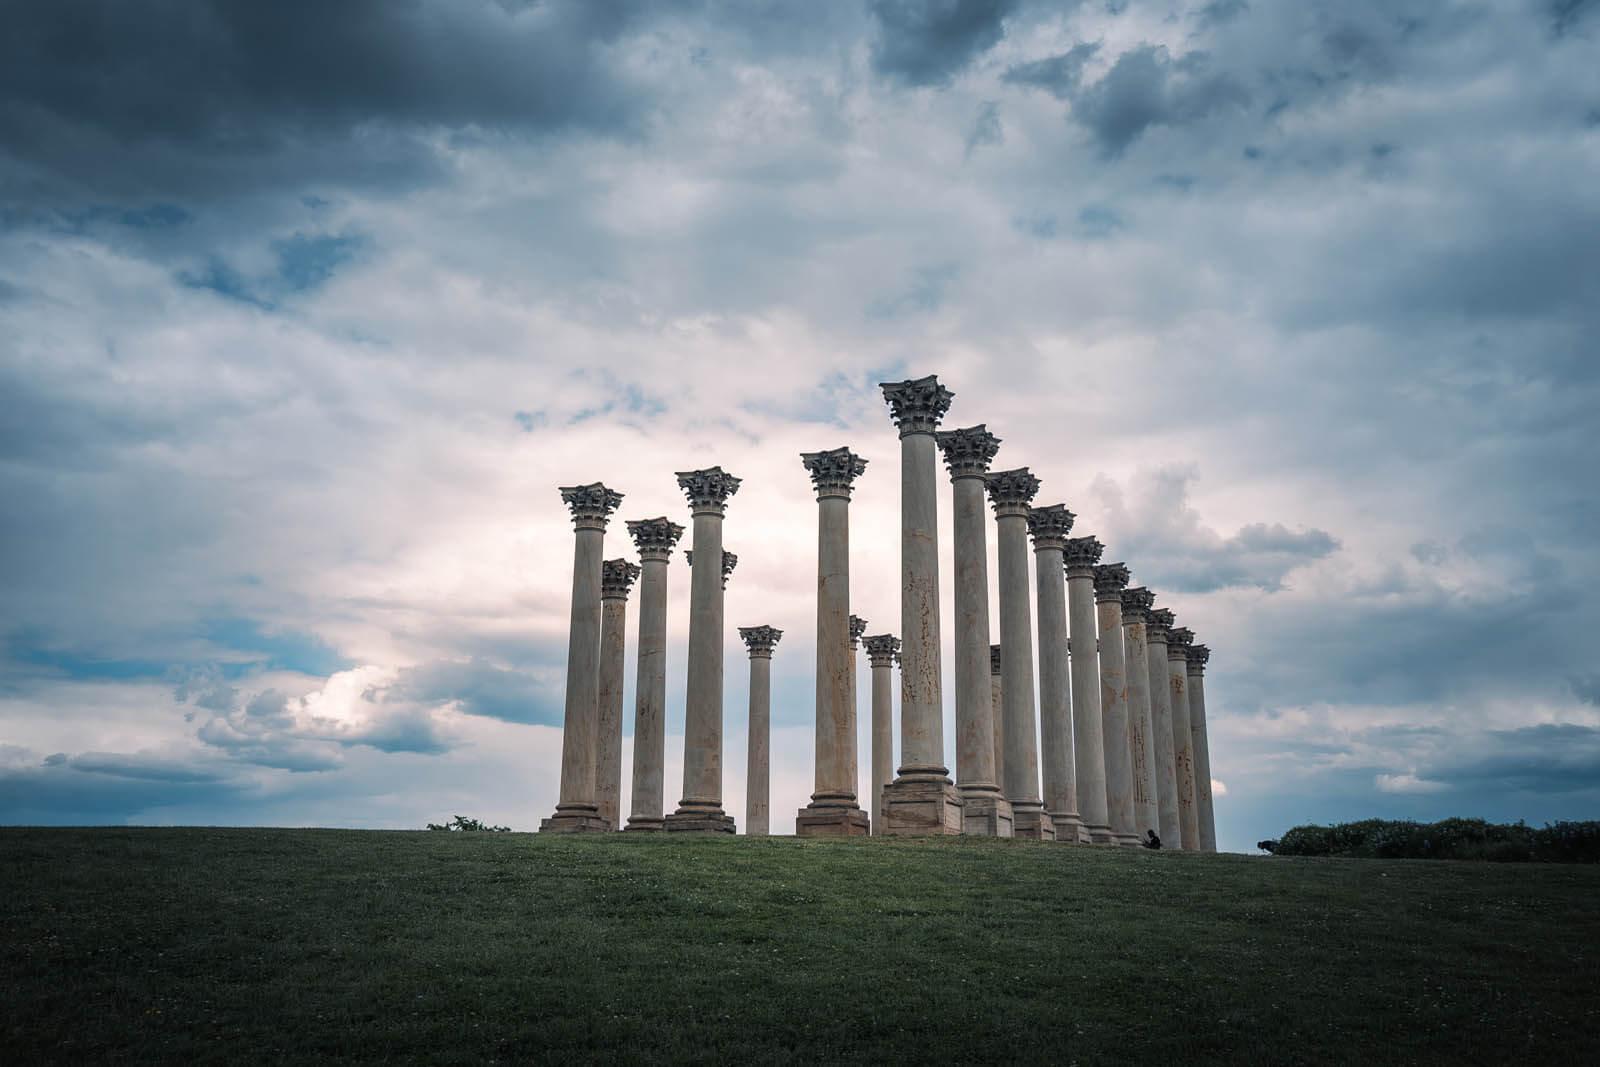 Capitol Columns at the Natioan Arboretum in Washington DC